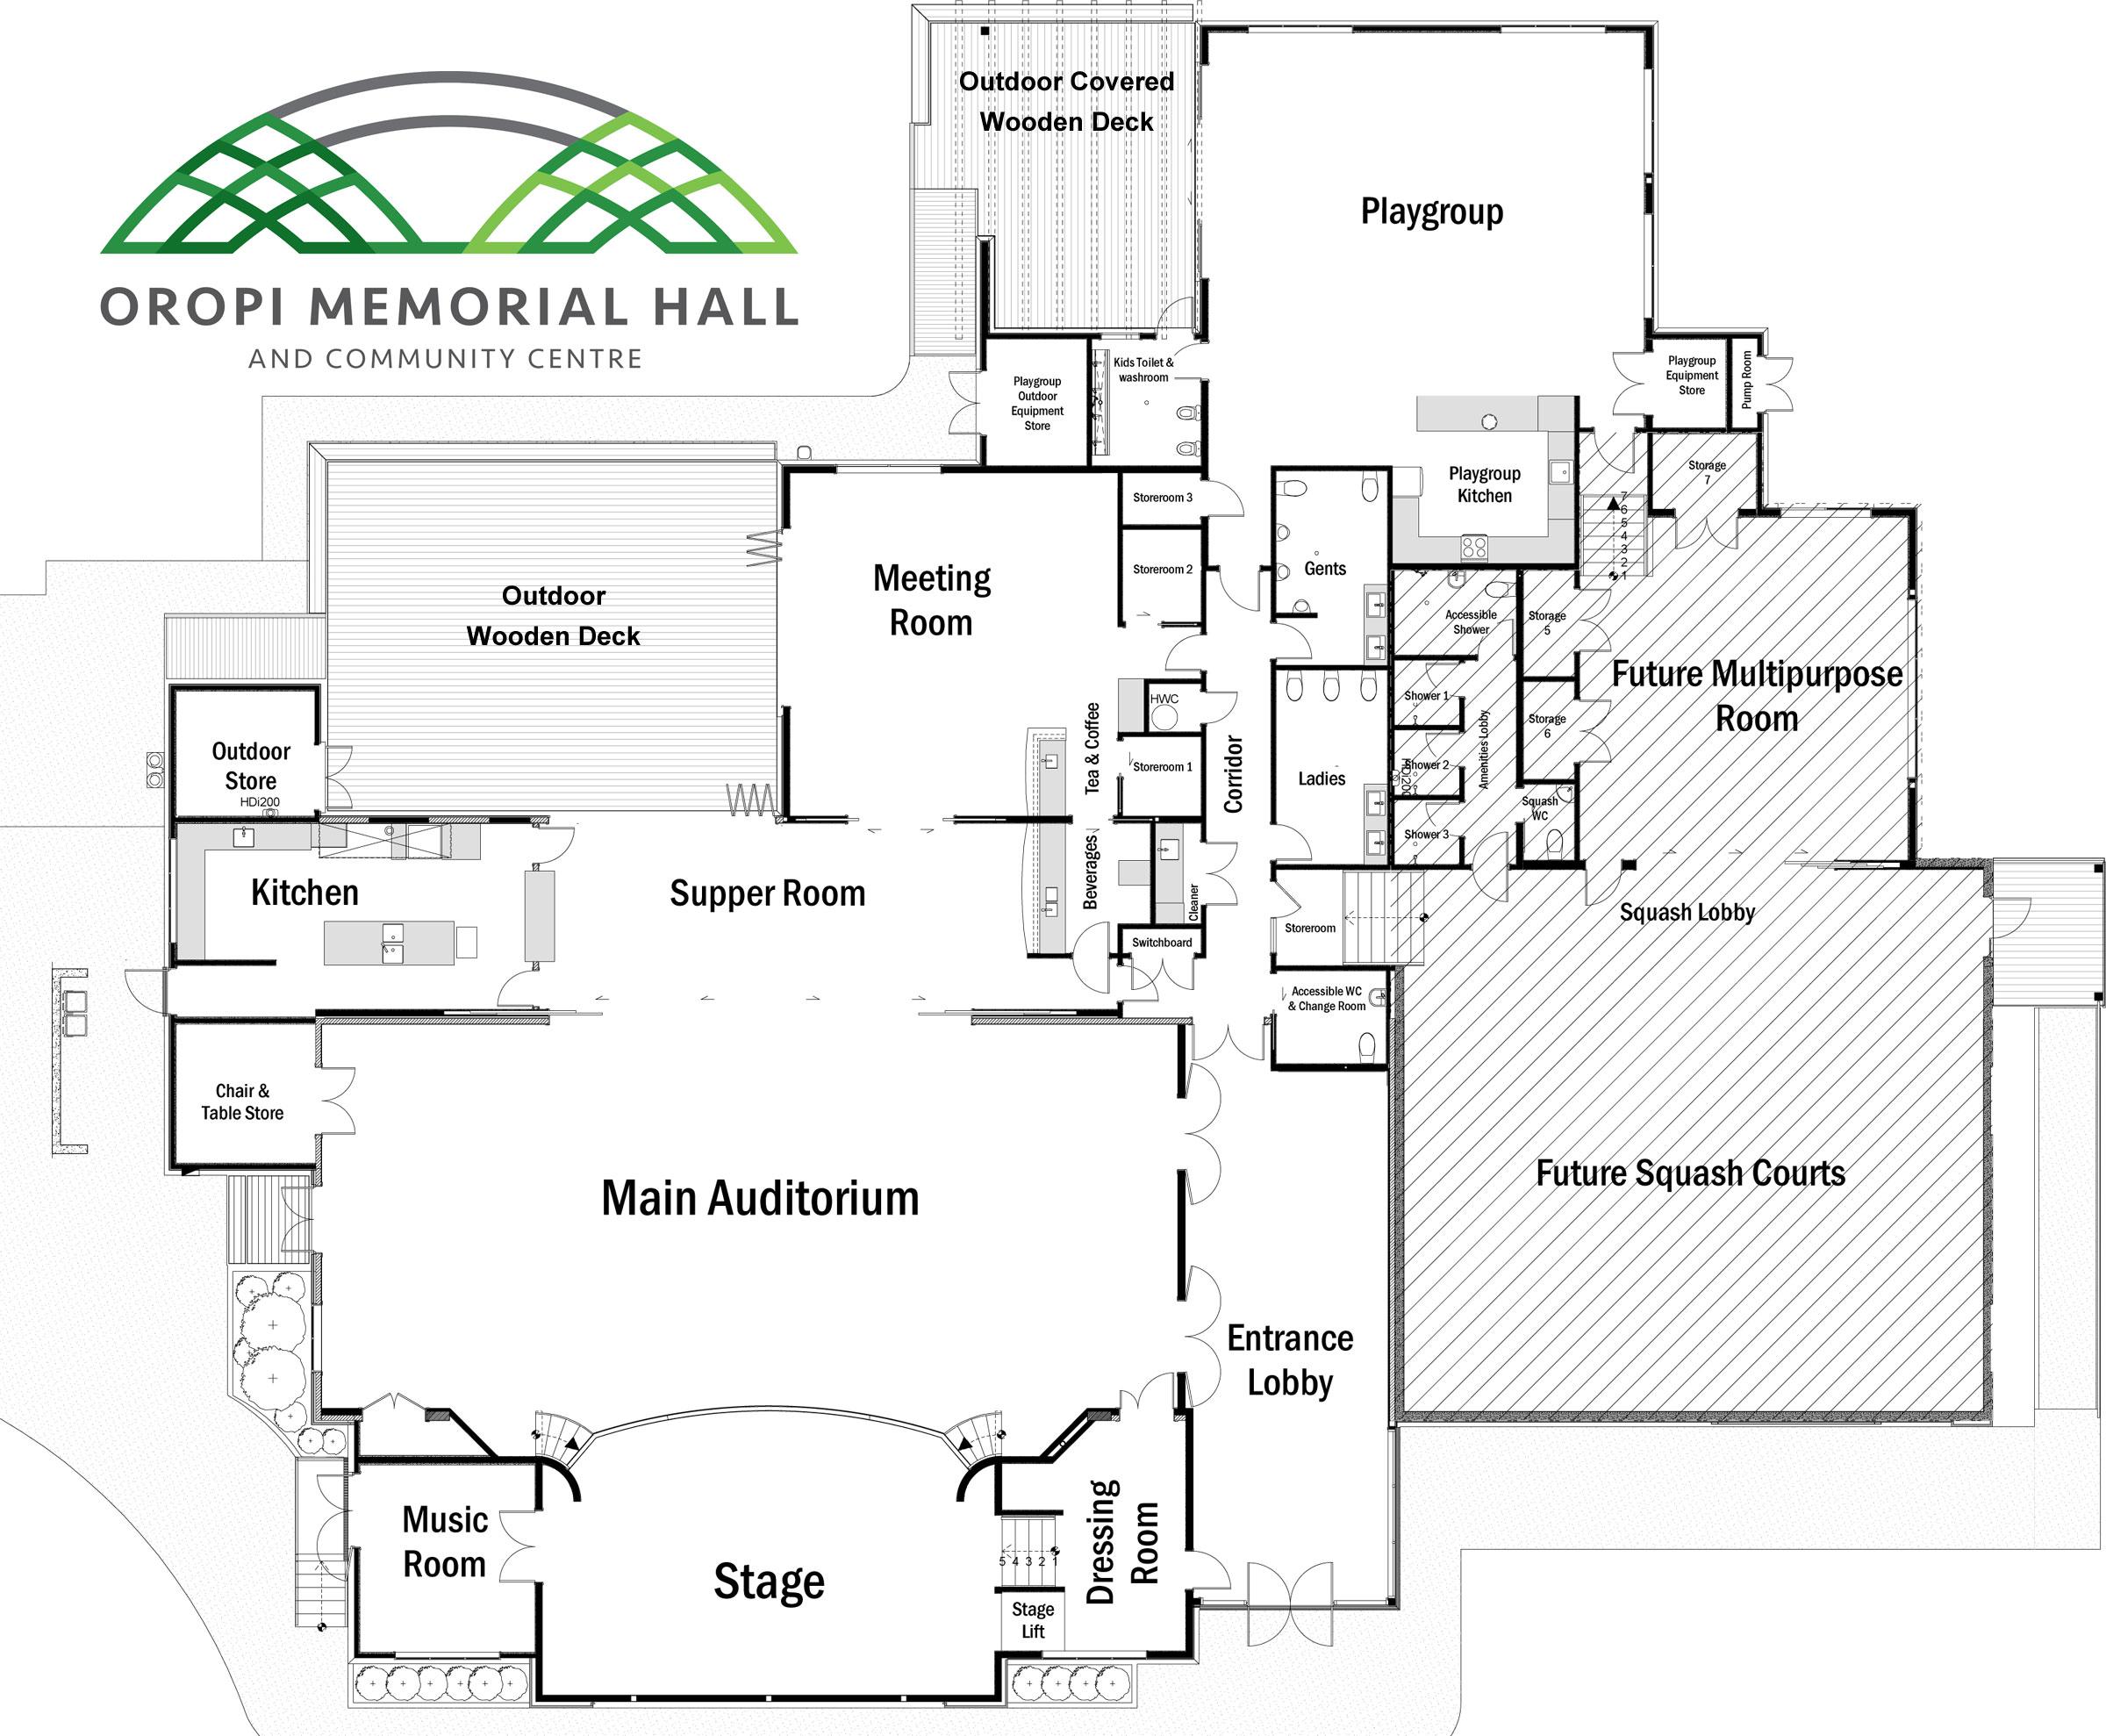 Hall-floor-plan-layout2017.jpg